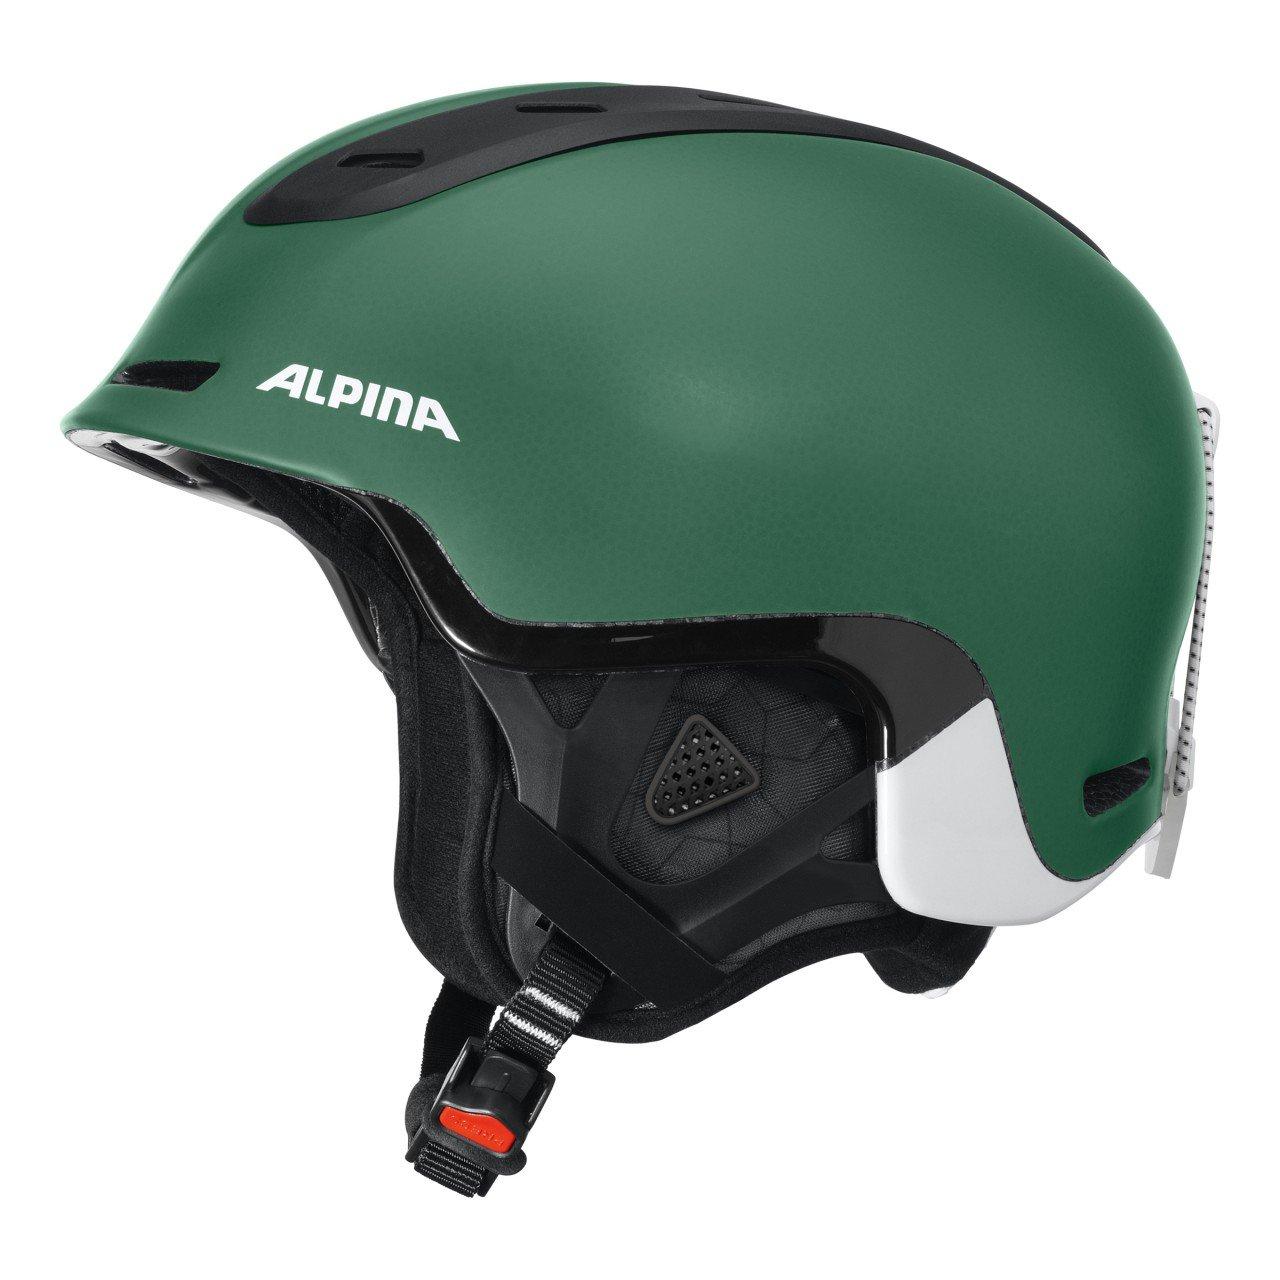 ALPINA Skihelm grün 55-59 B01HDNHOQO Ski Alpin Hervorragende Funktion